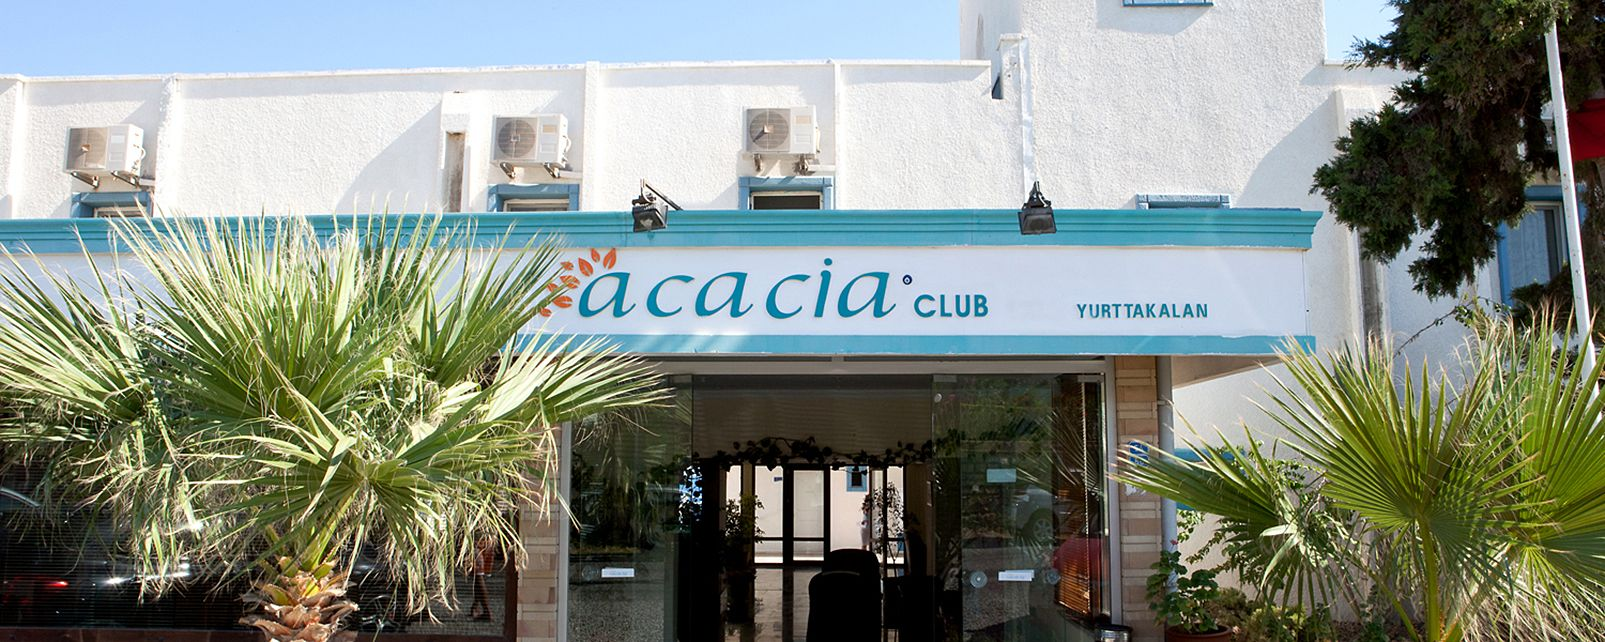 Hôtel Acacia Club